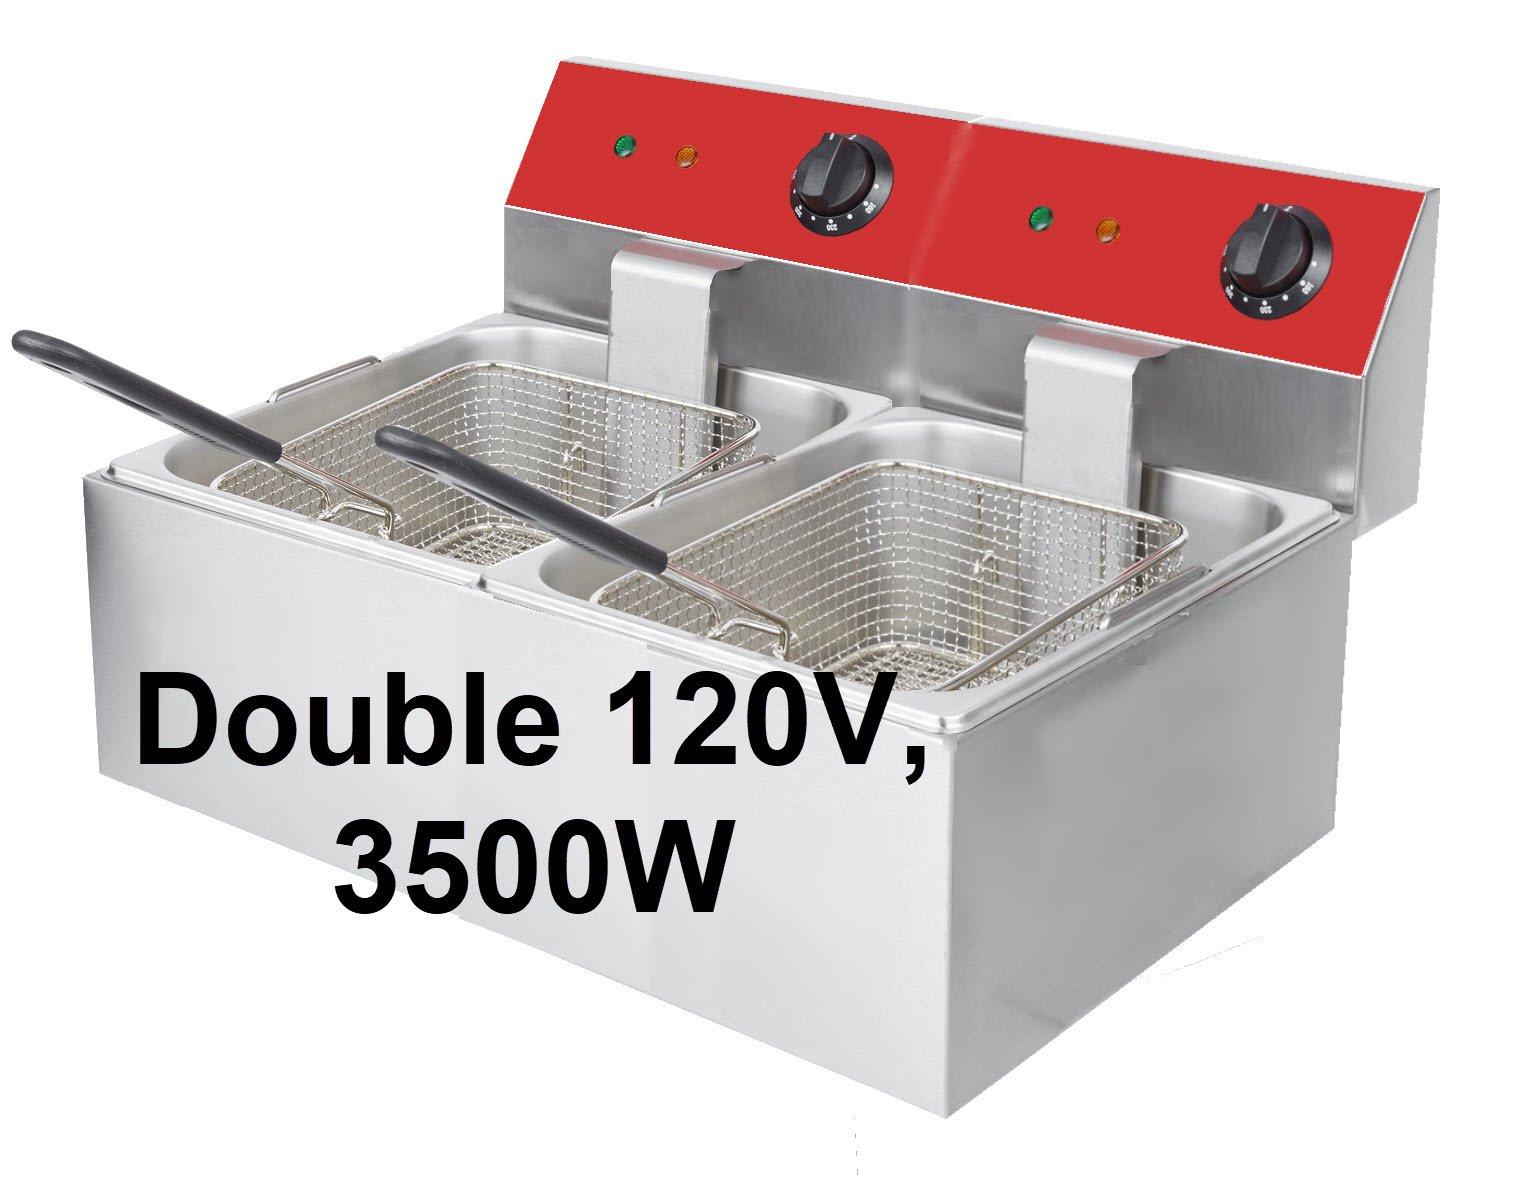 Dual Tank 20 Lb Electric Counter-top Fryer 120V 3500W